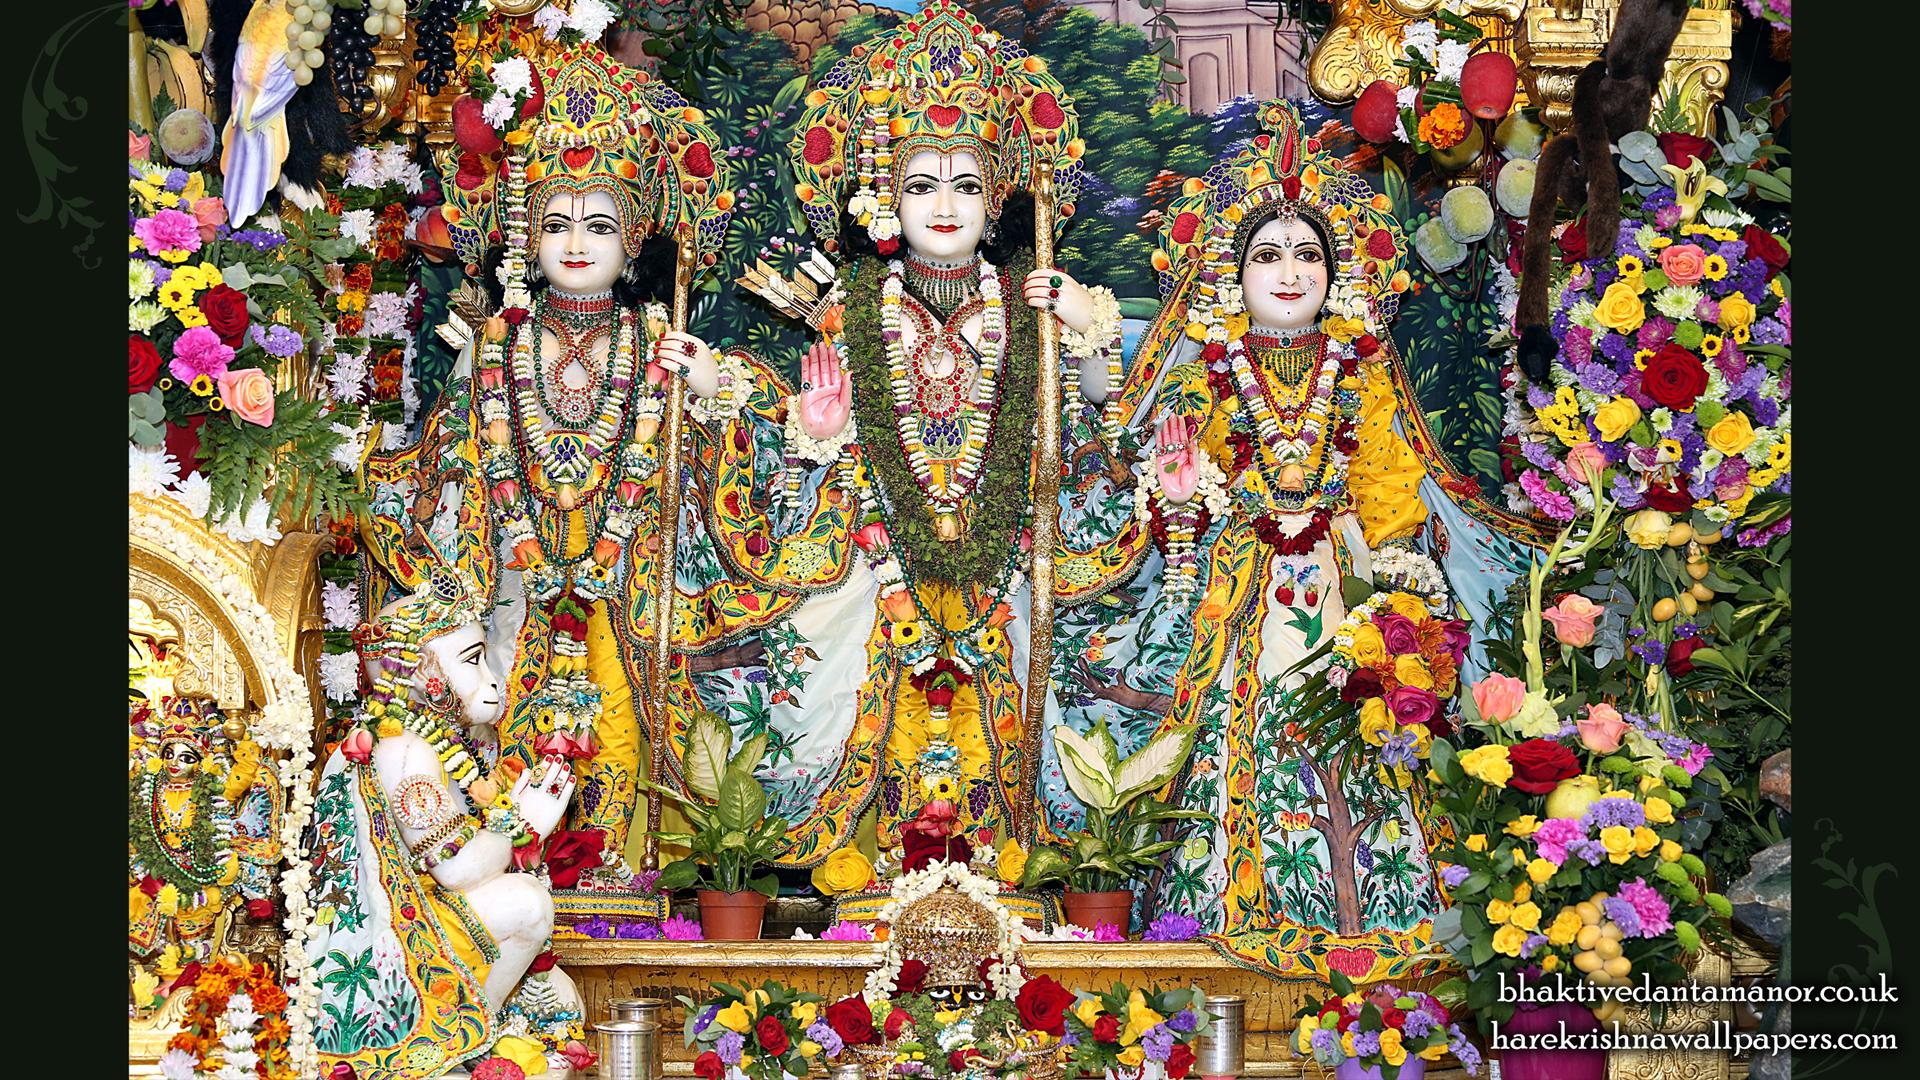 Sri Sri Sita Rama Laxman Hanuman Wallpaper (012) Size 1920x1080 Download